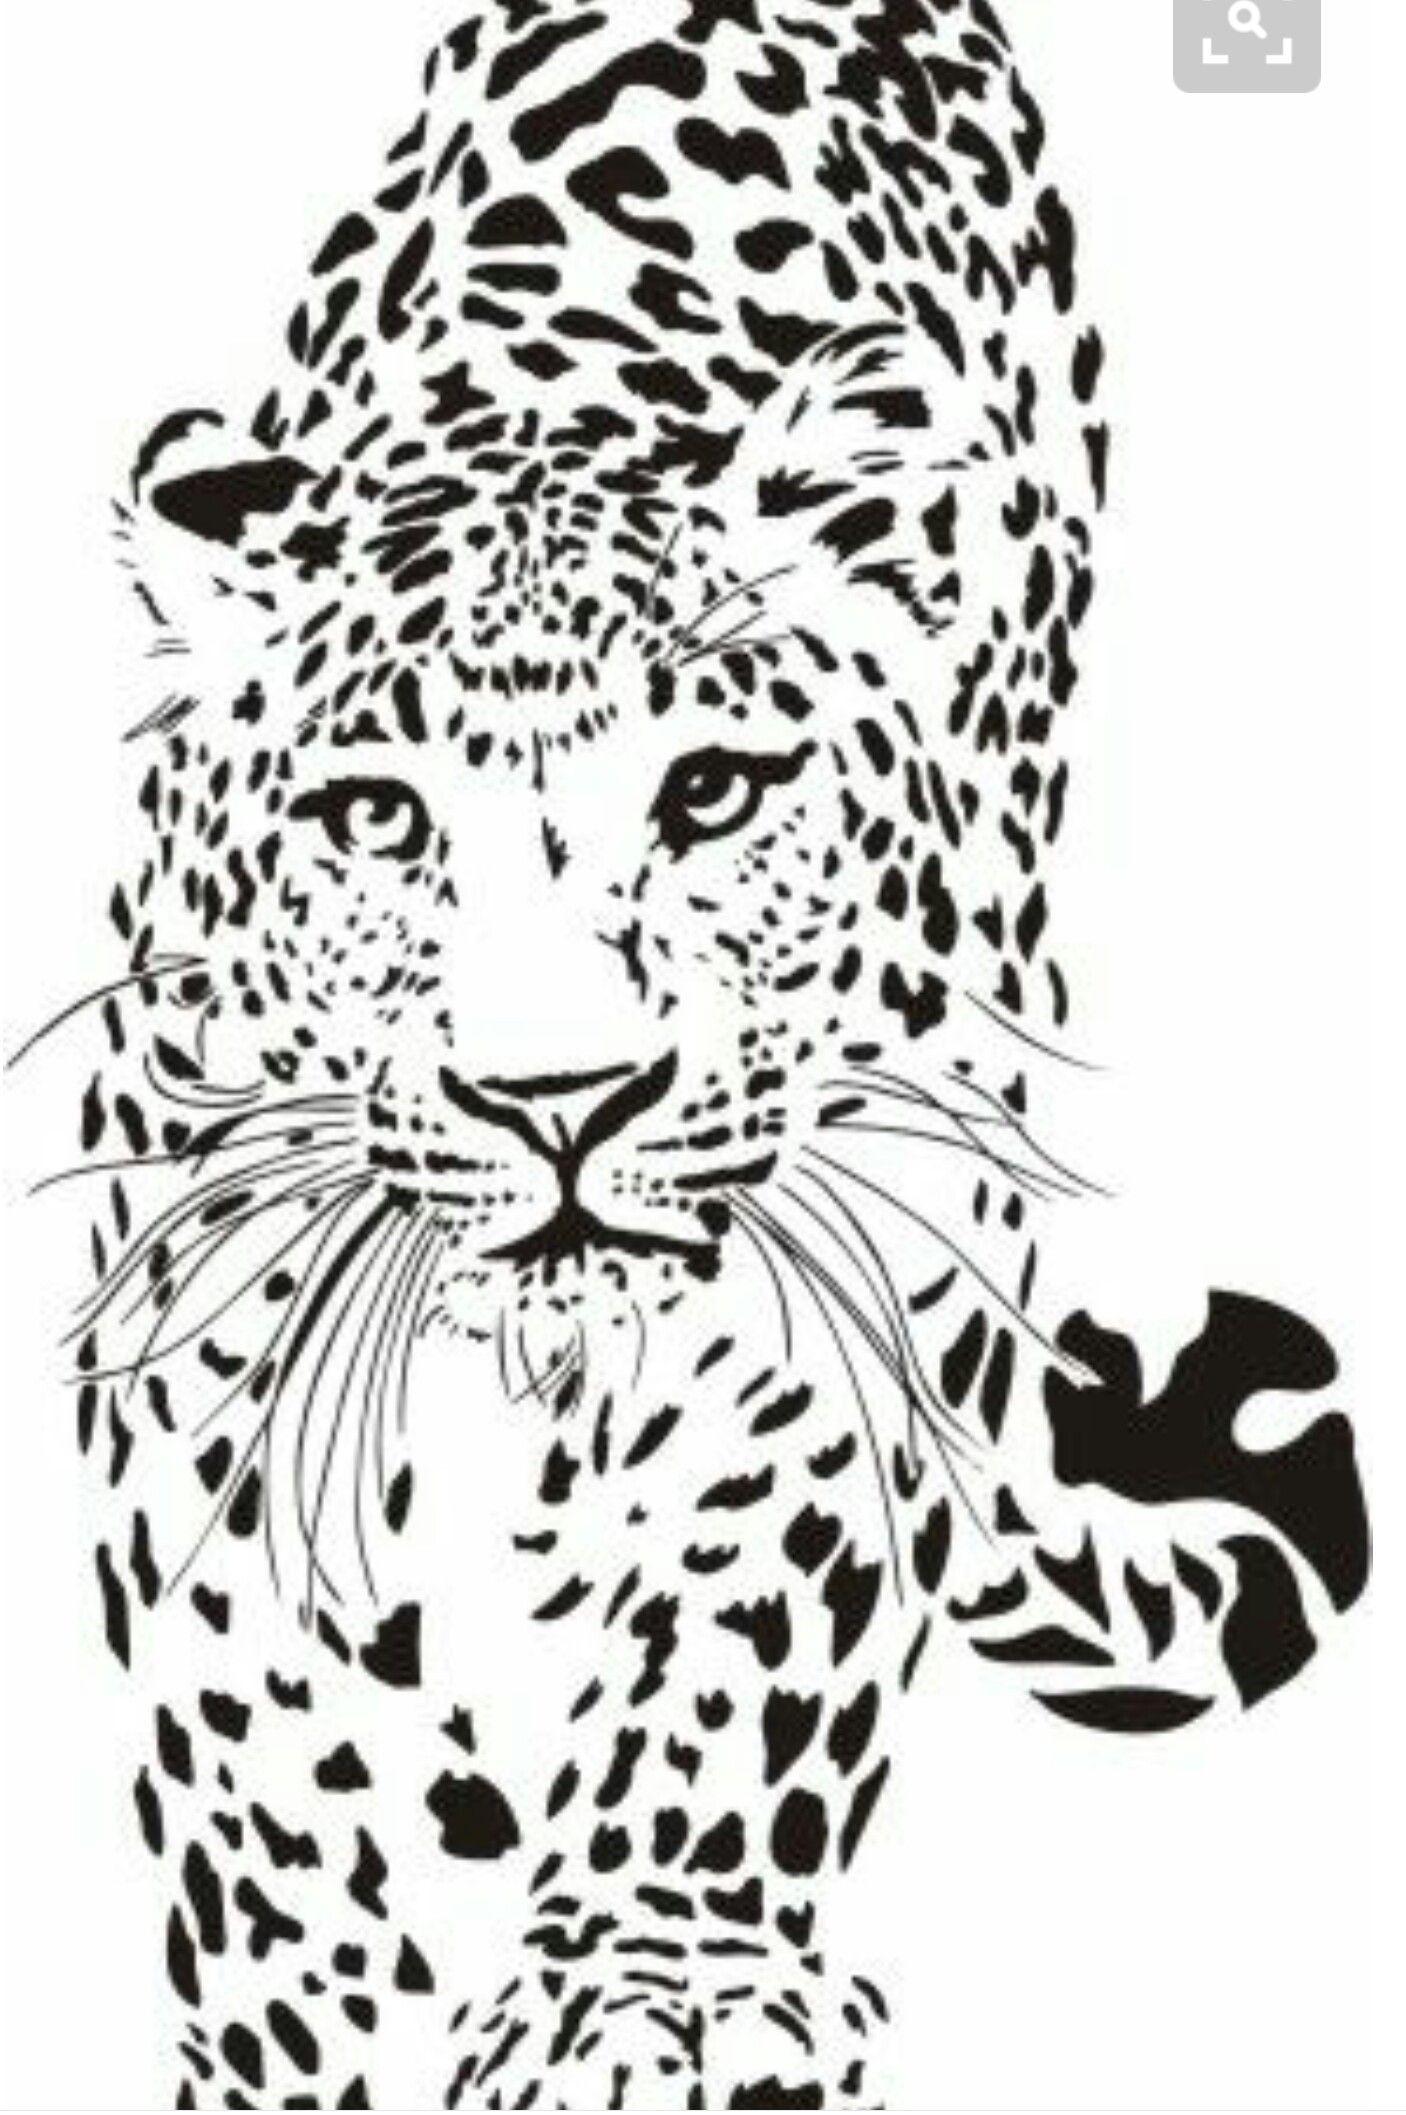 Amazon.com: Leopard Print Stencil by StudioR12 | Repeating Pattern ...